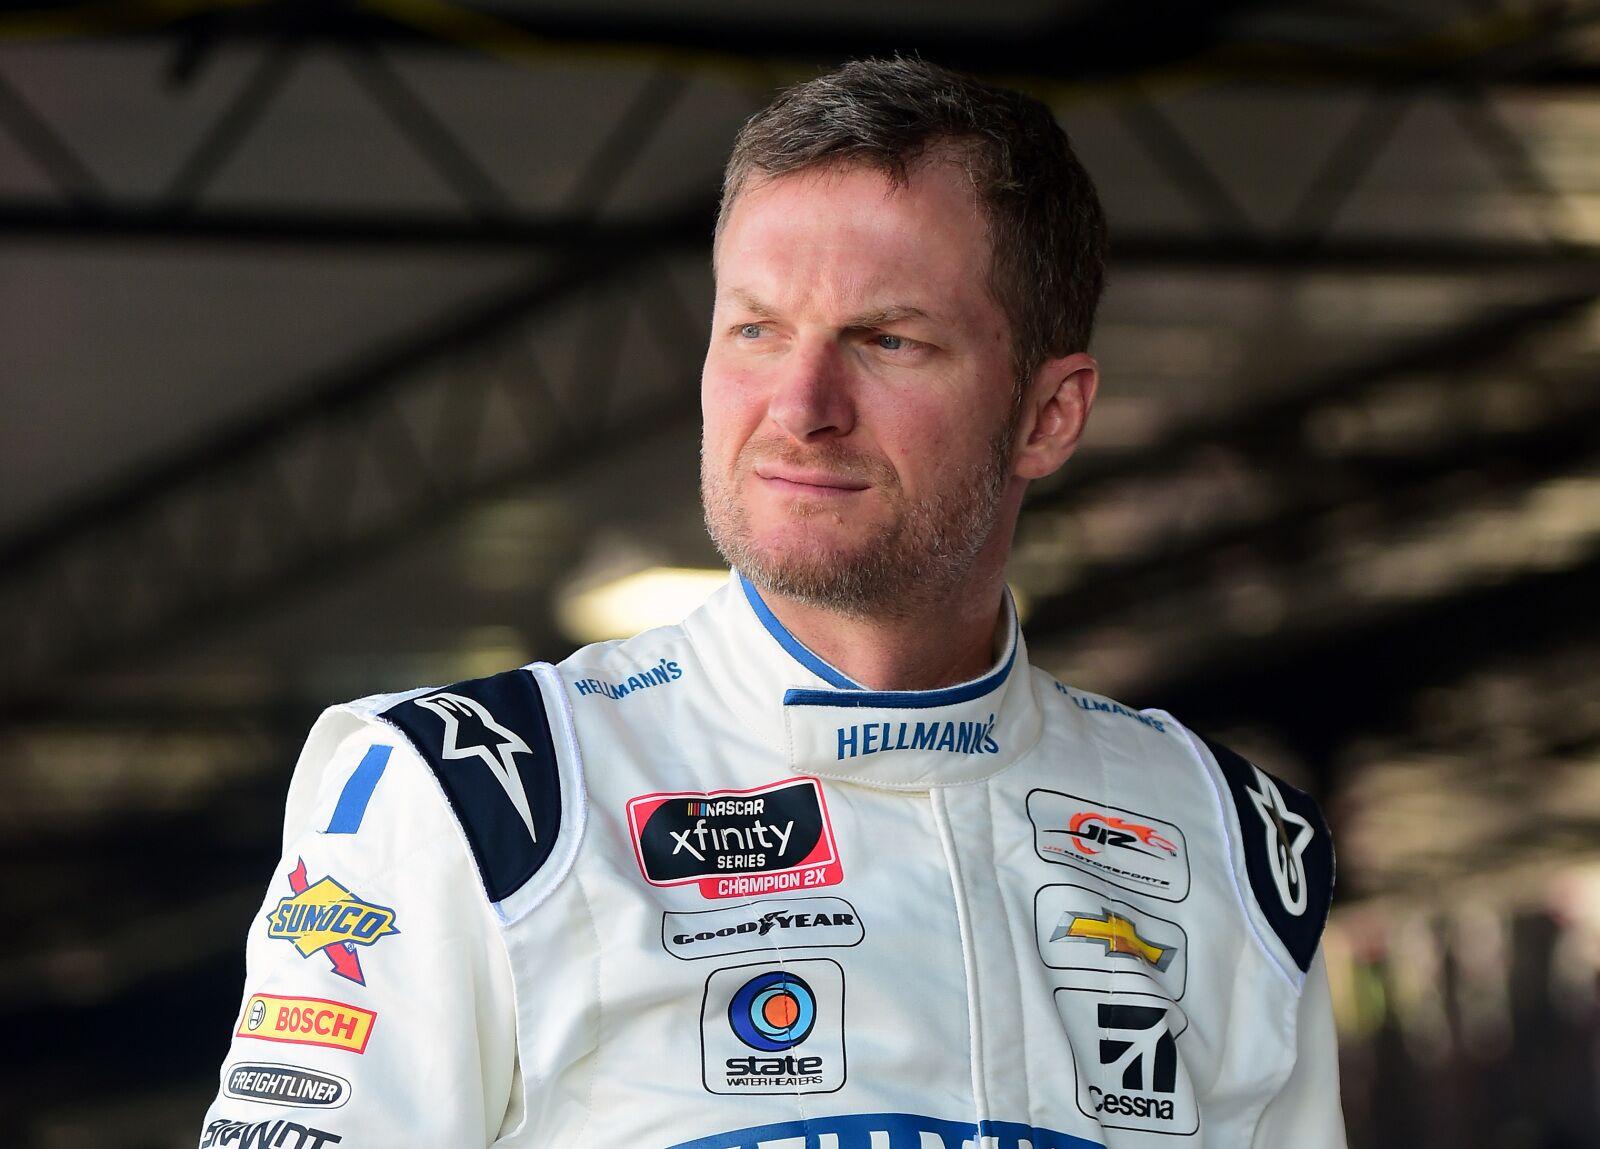 NASCAR: Dale Earnhardt Jr. to open up the 2020 season at Daytona